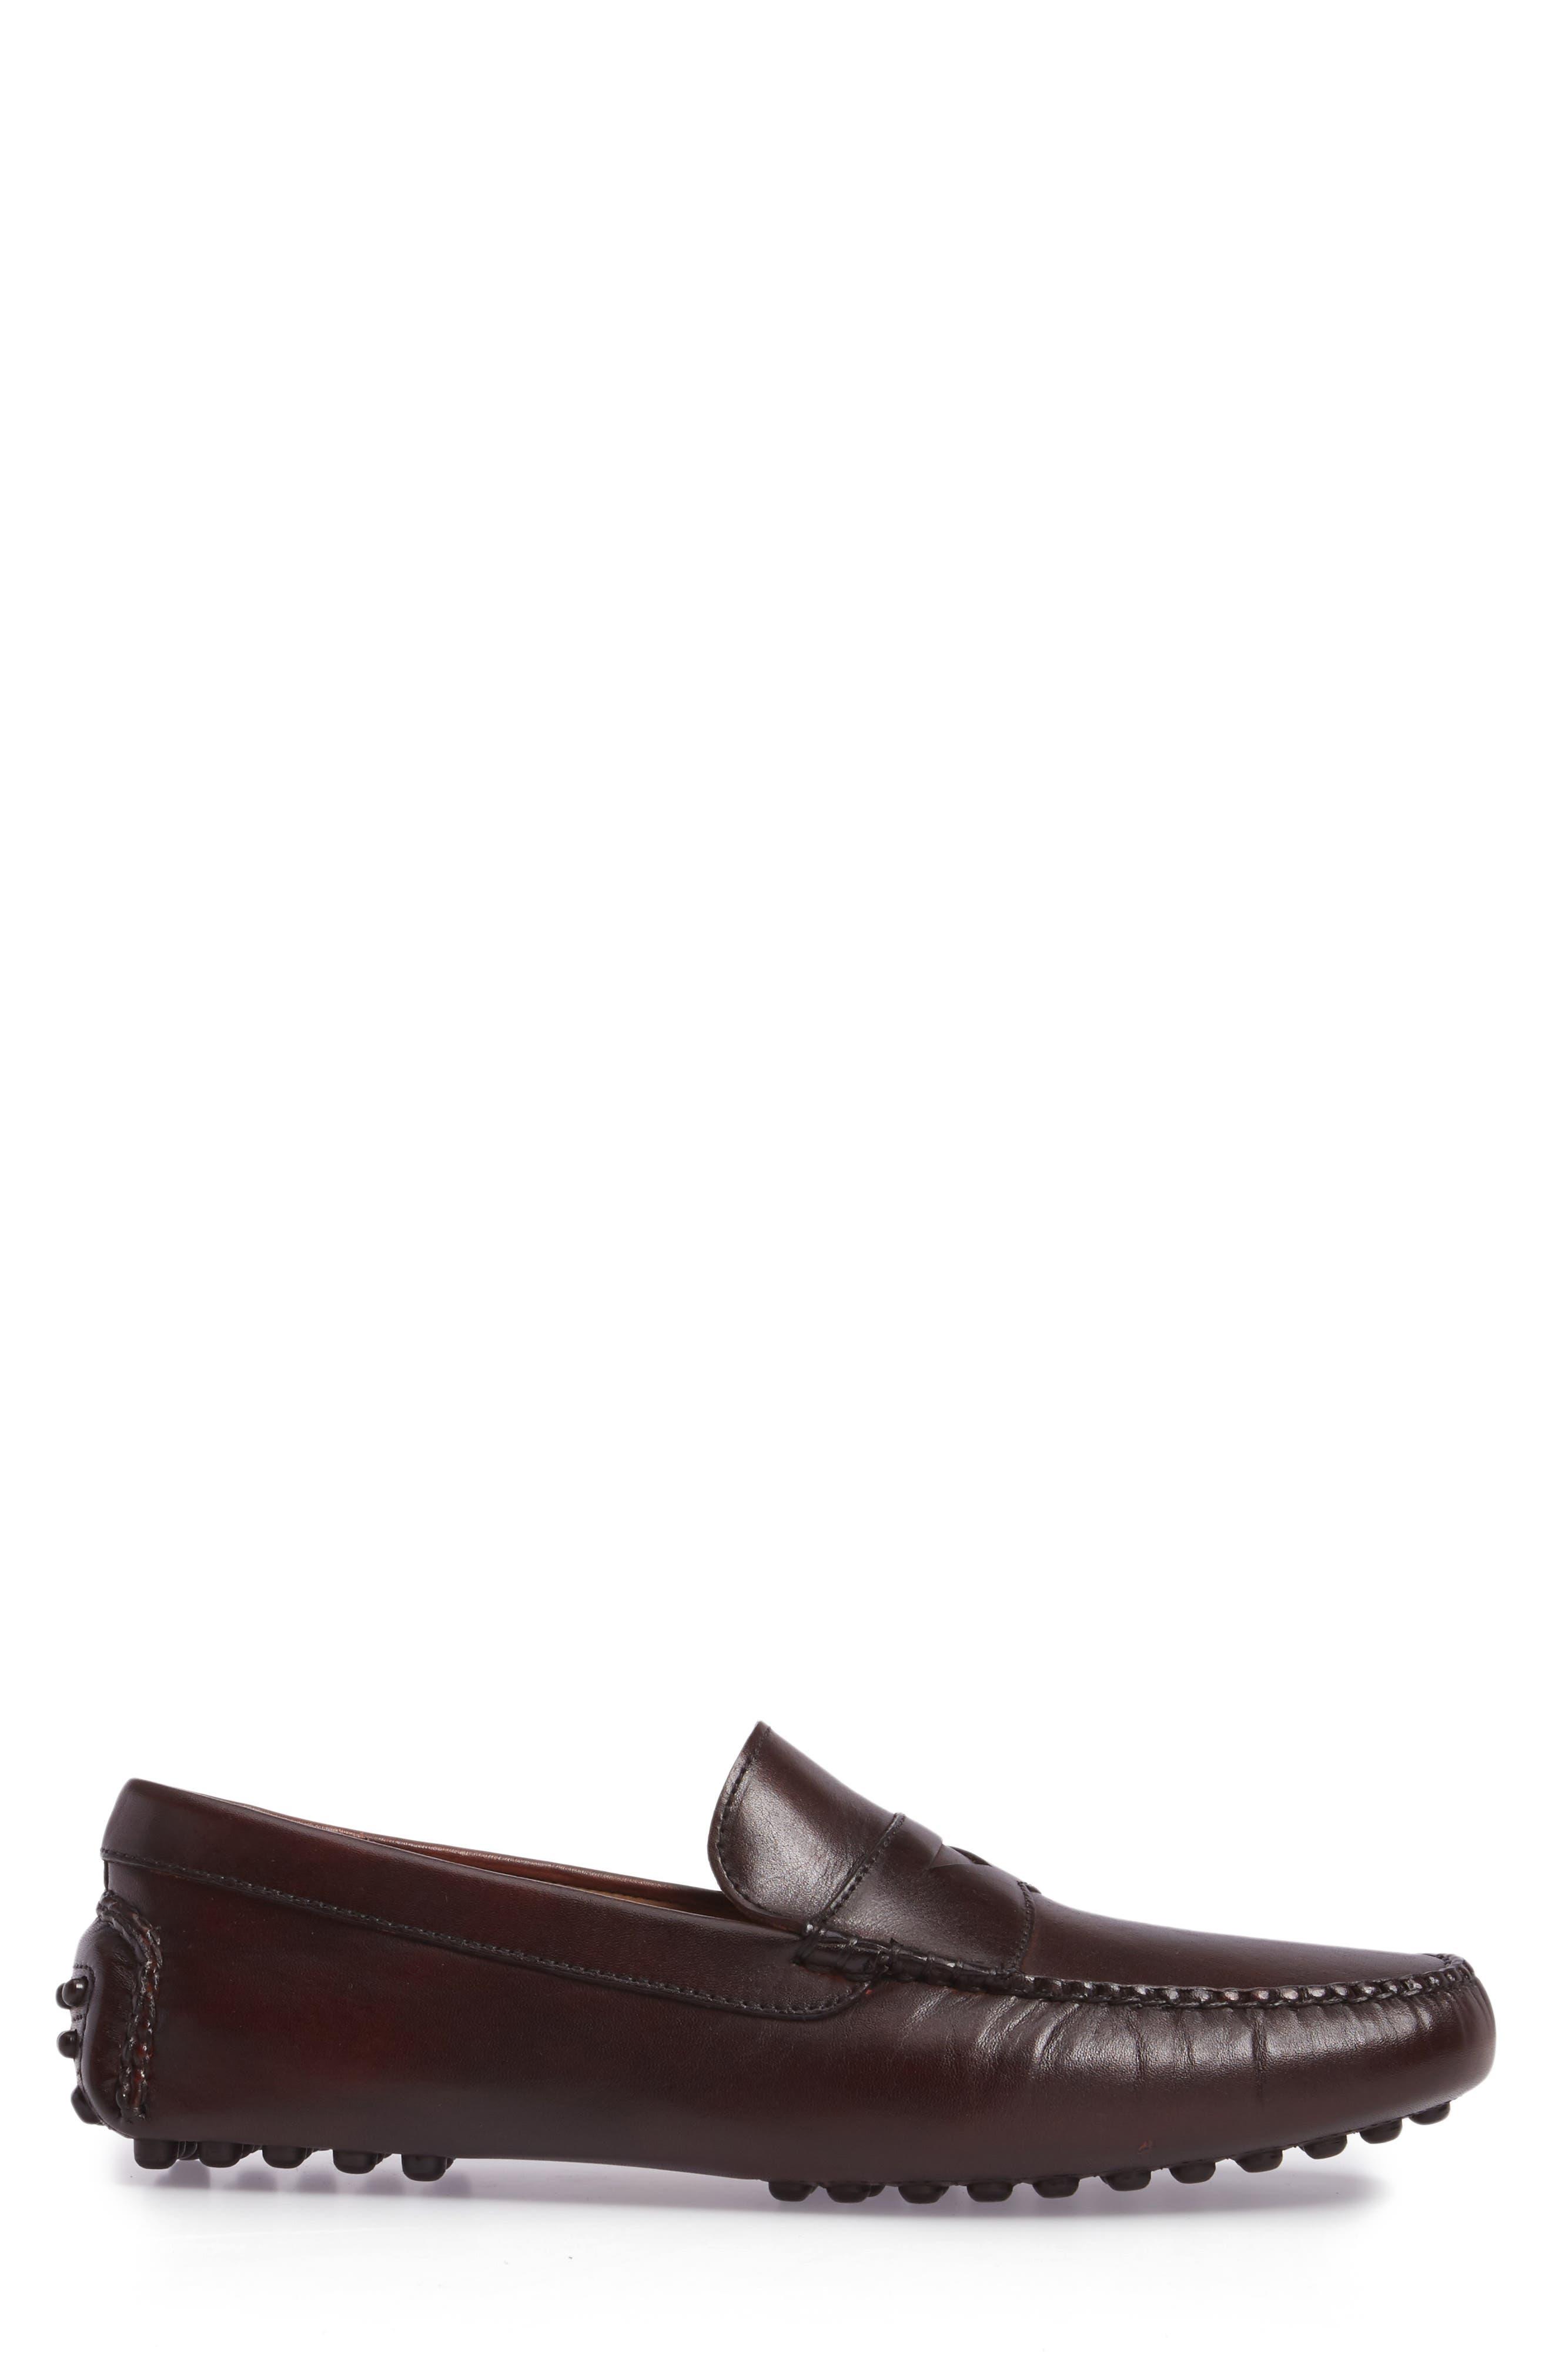 Alternate Image 3  - John W. Nordstrom® Eaton Driving Shoe (Men)